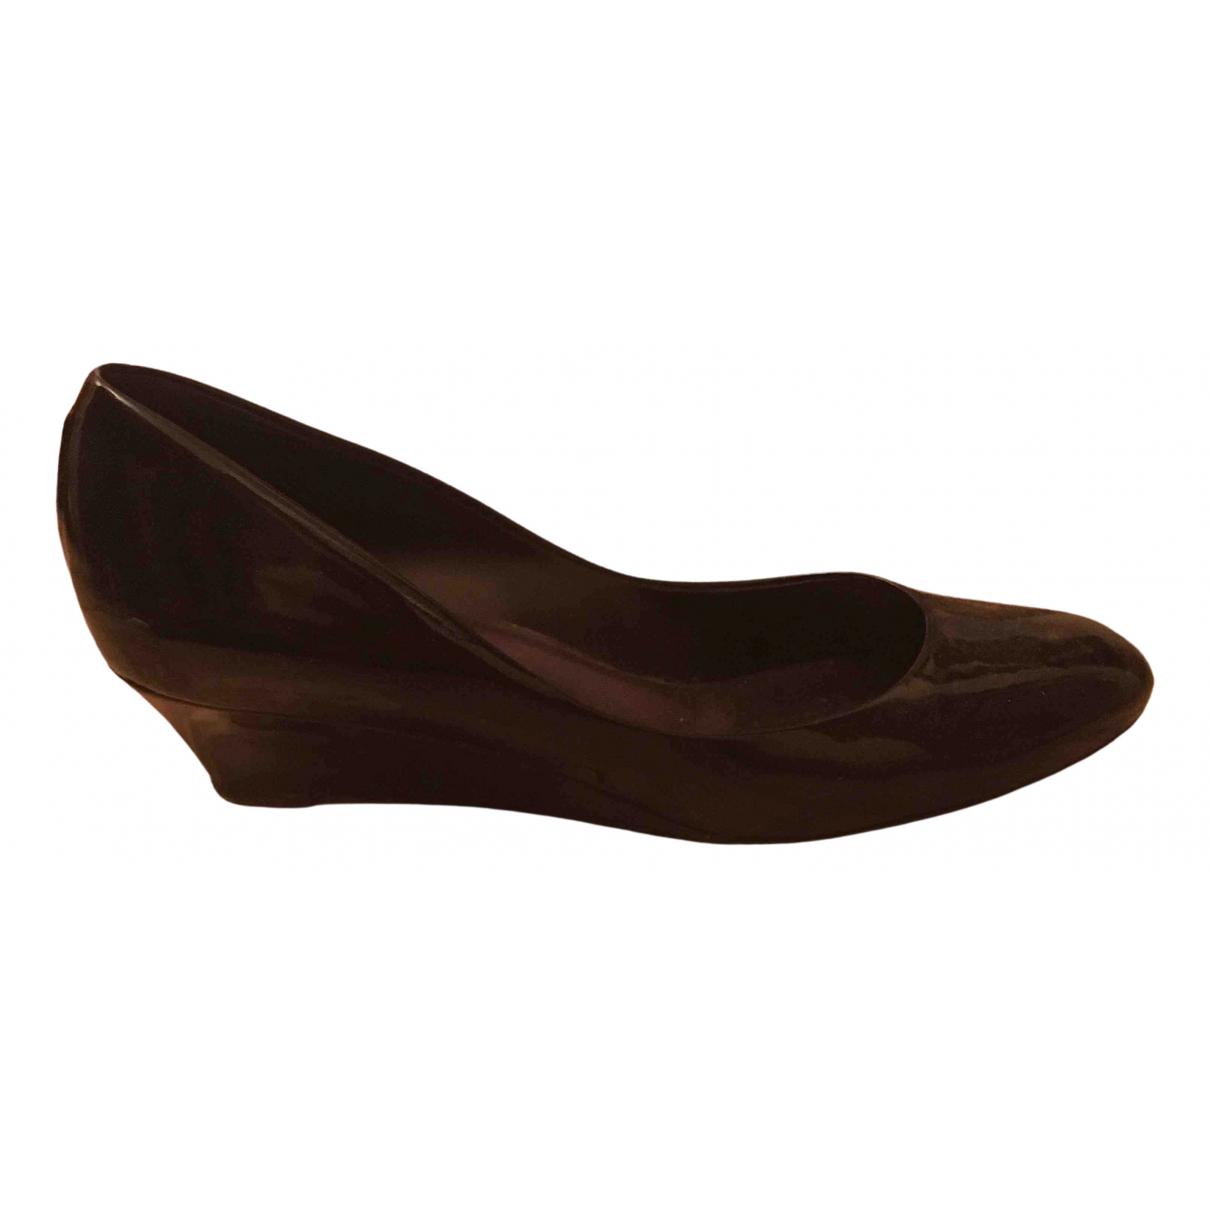 Armani Collezioni \N Black Patent leather Heels for Women 38 EU